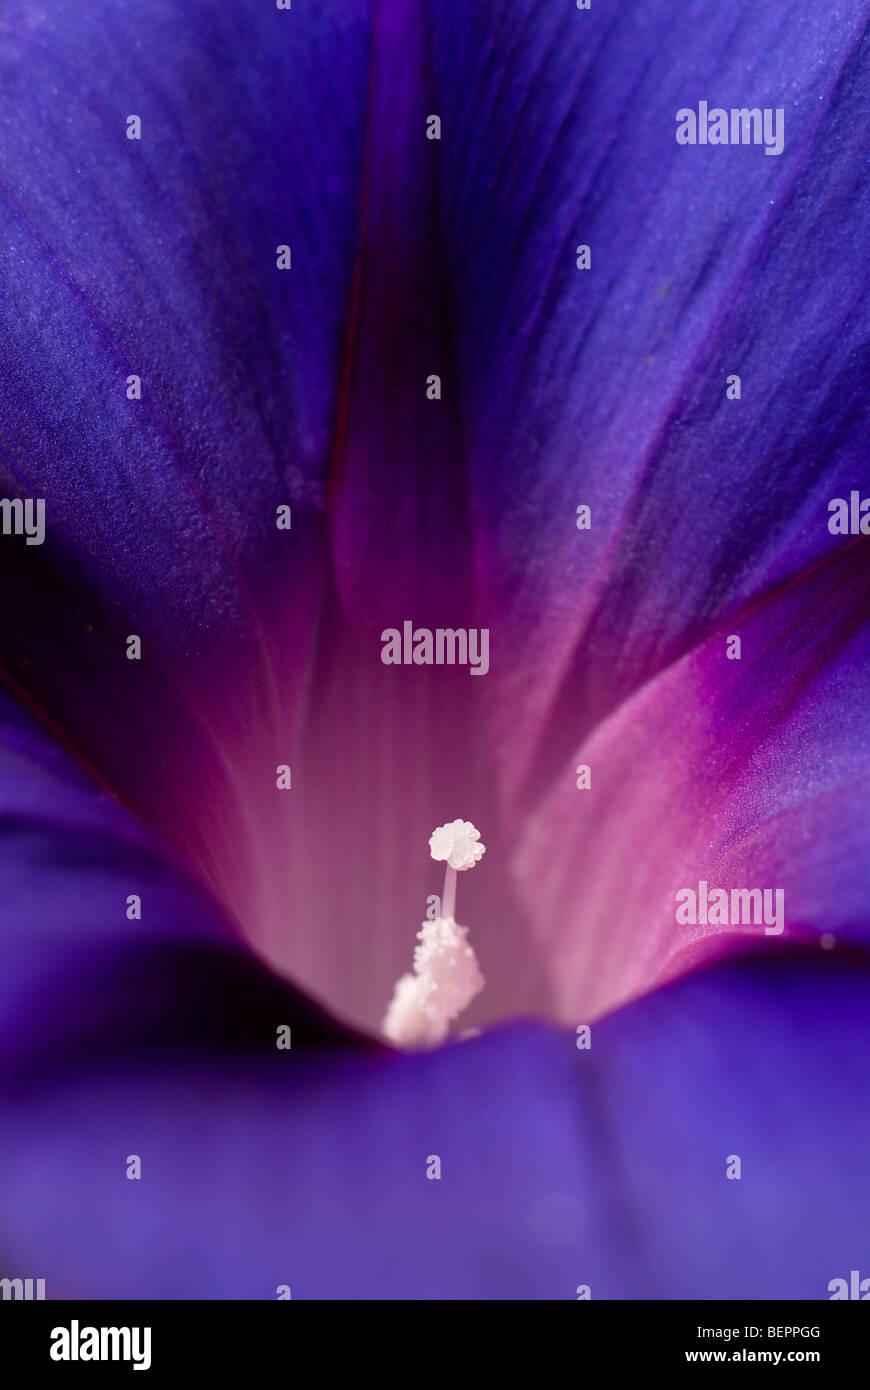 Morning glory, blue flower, royal blue, white, stamen, flower, flowers, creeper, macro, close-up, close up - Stock Image